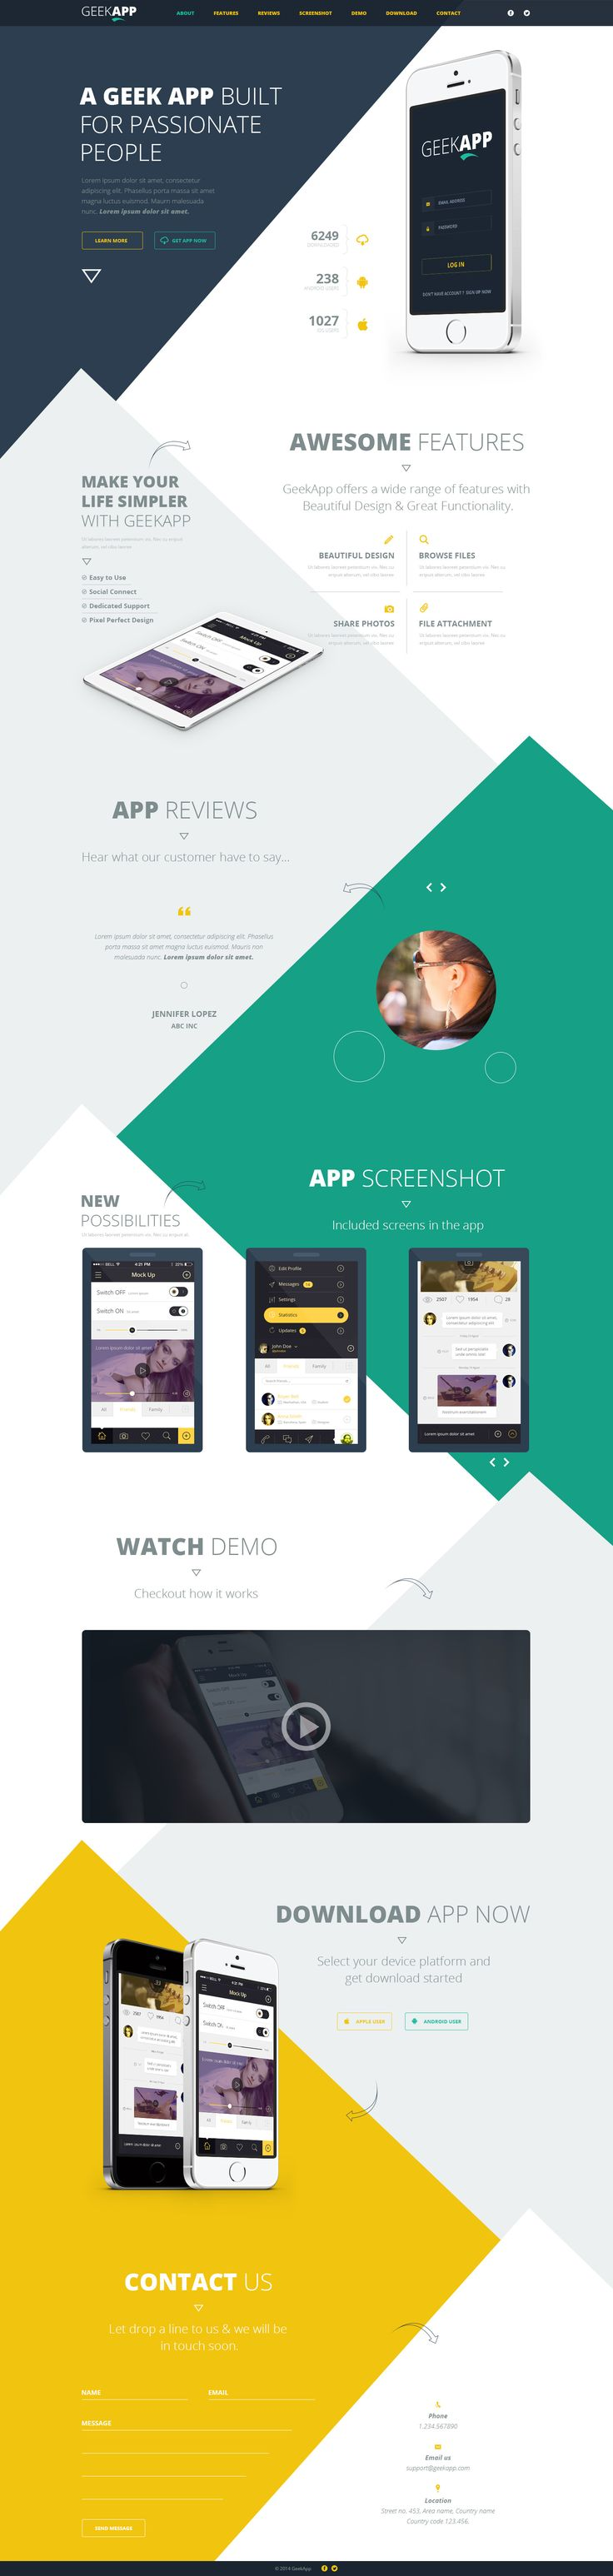 GeekApp - One Page App Landing PSD Template #web #design